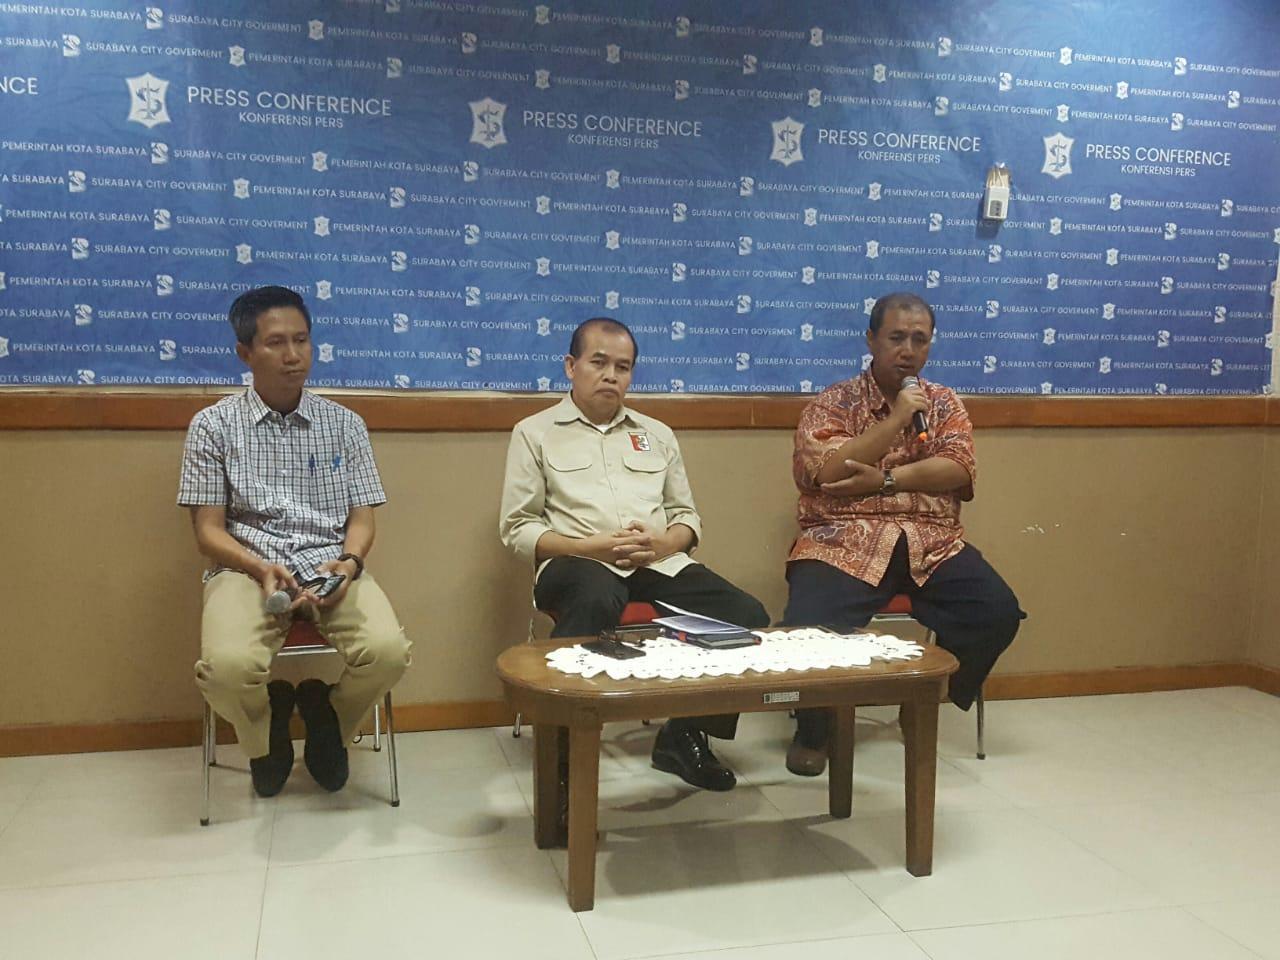 Jadi Tuan Rumah, Wali Kota Risma Akan Membuka Kejuaraan Menembak di Surabaya